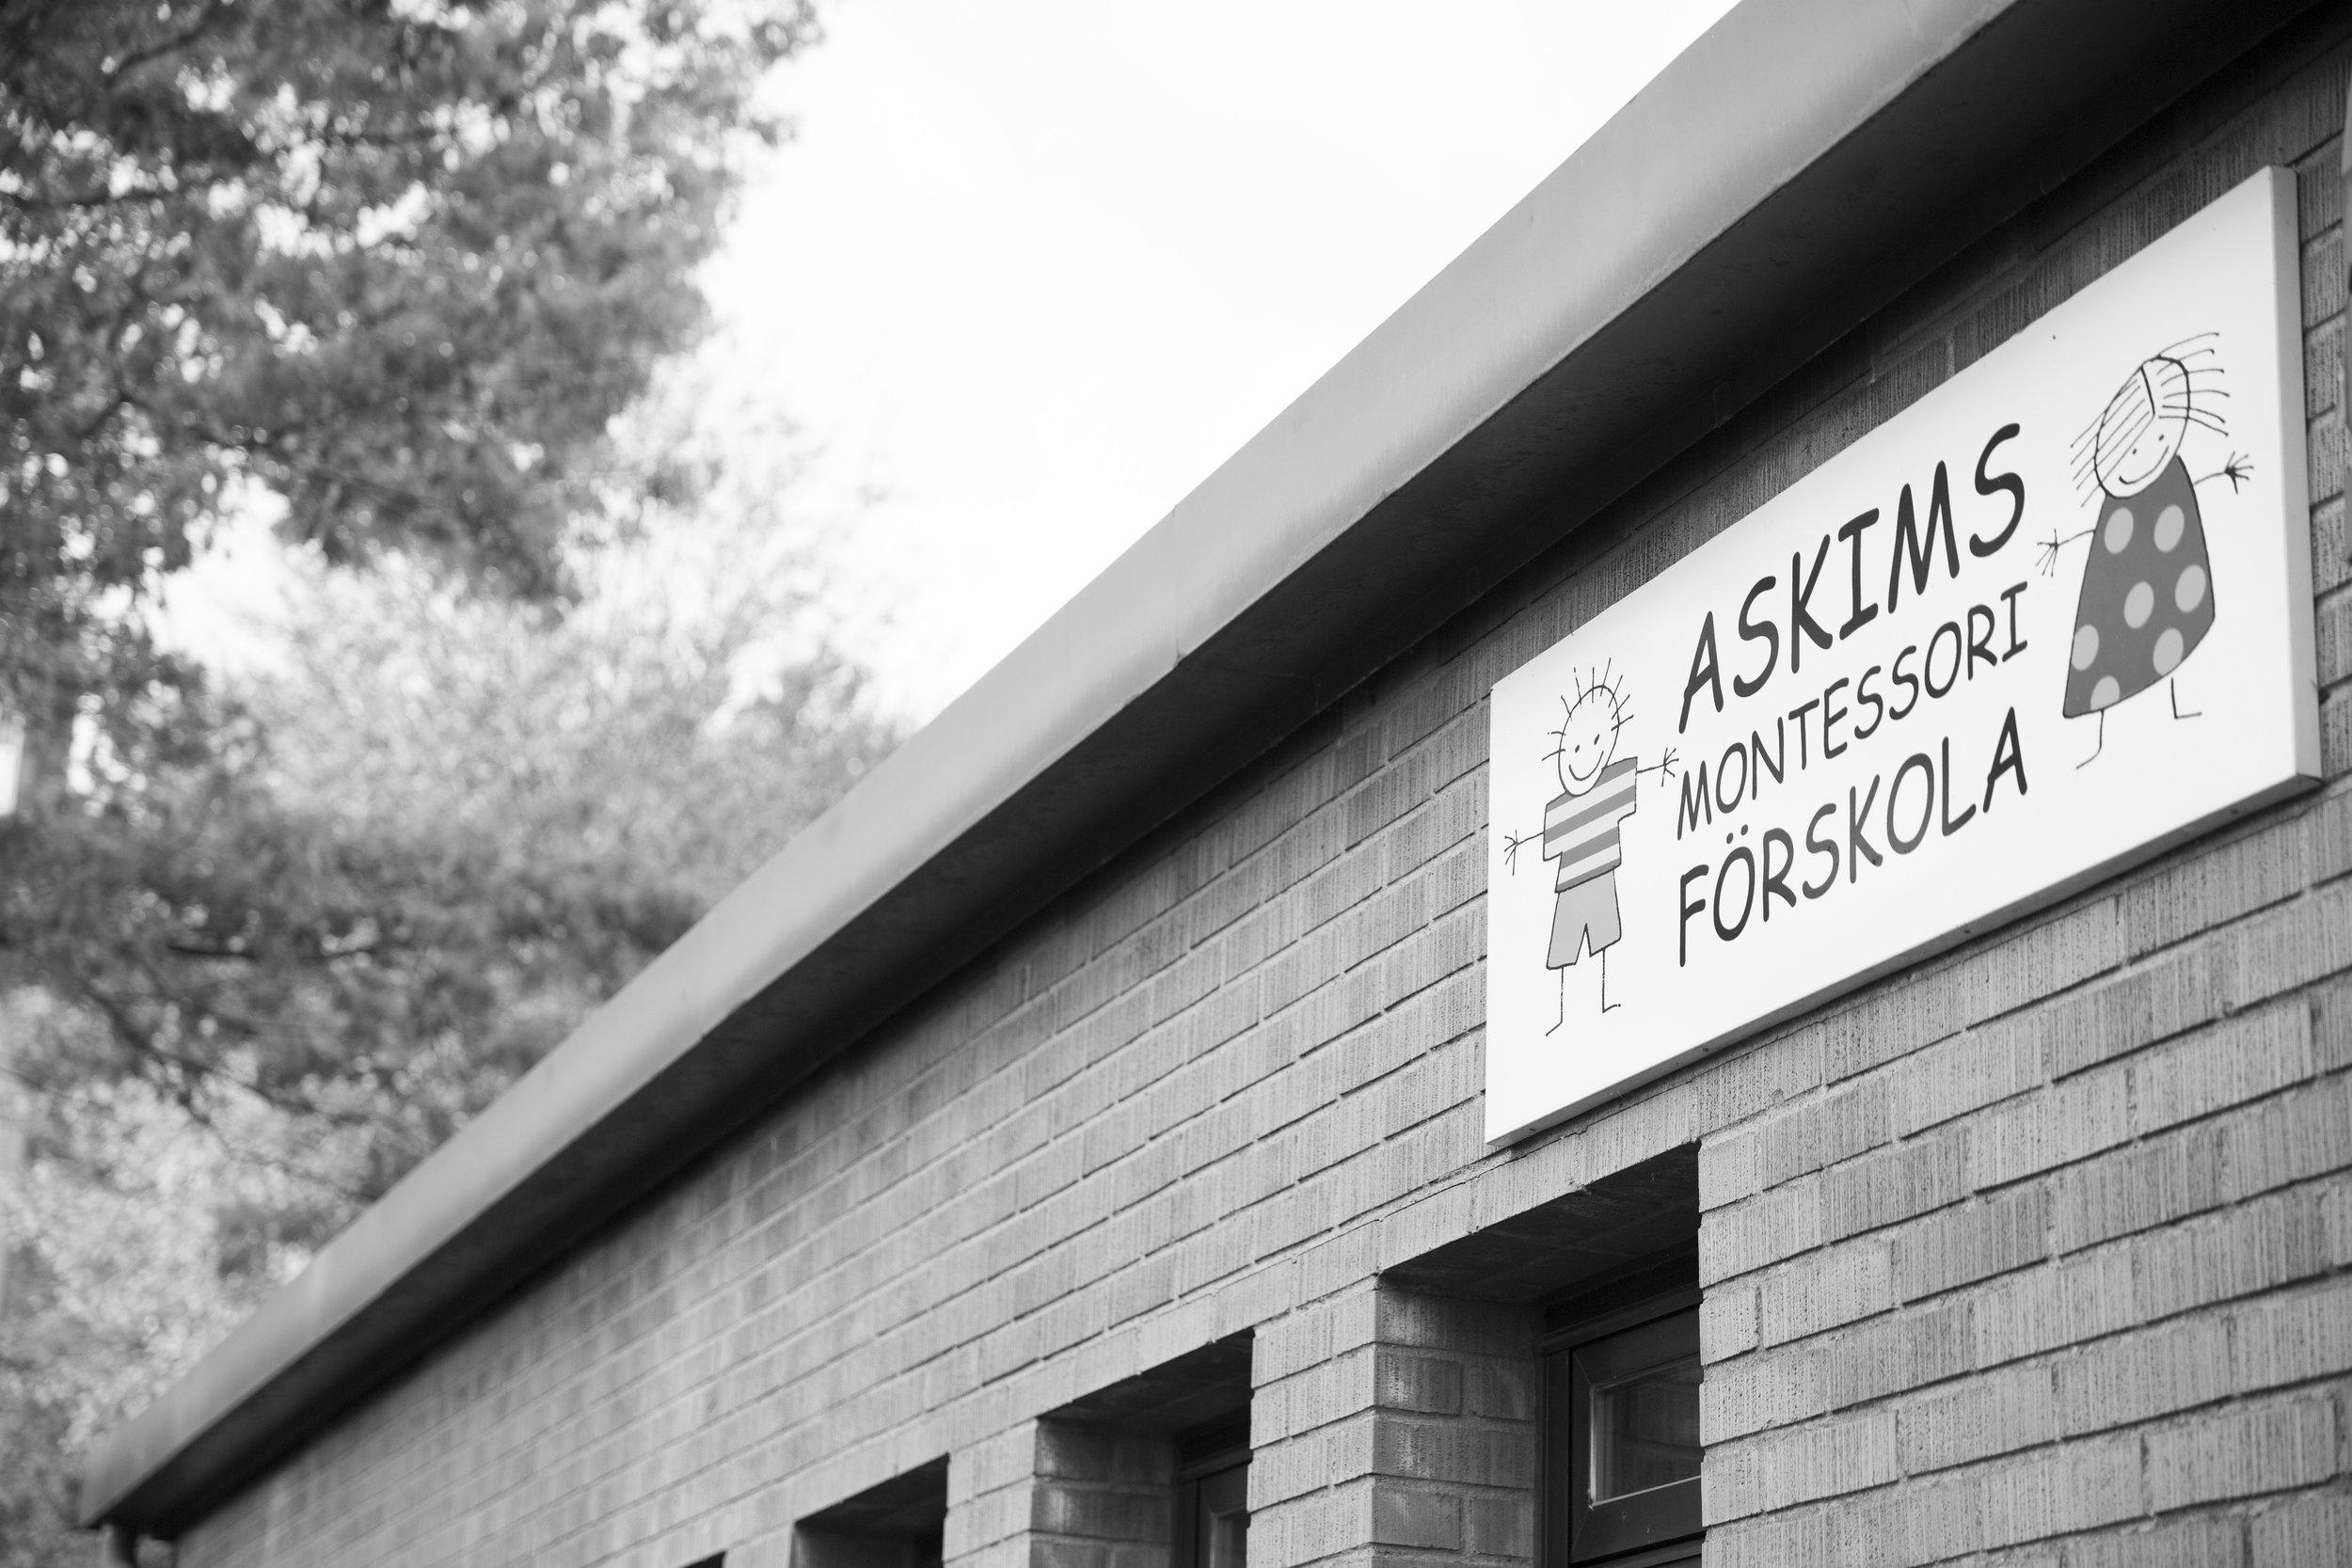 Askims Montessoriförskola - Vår skylt